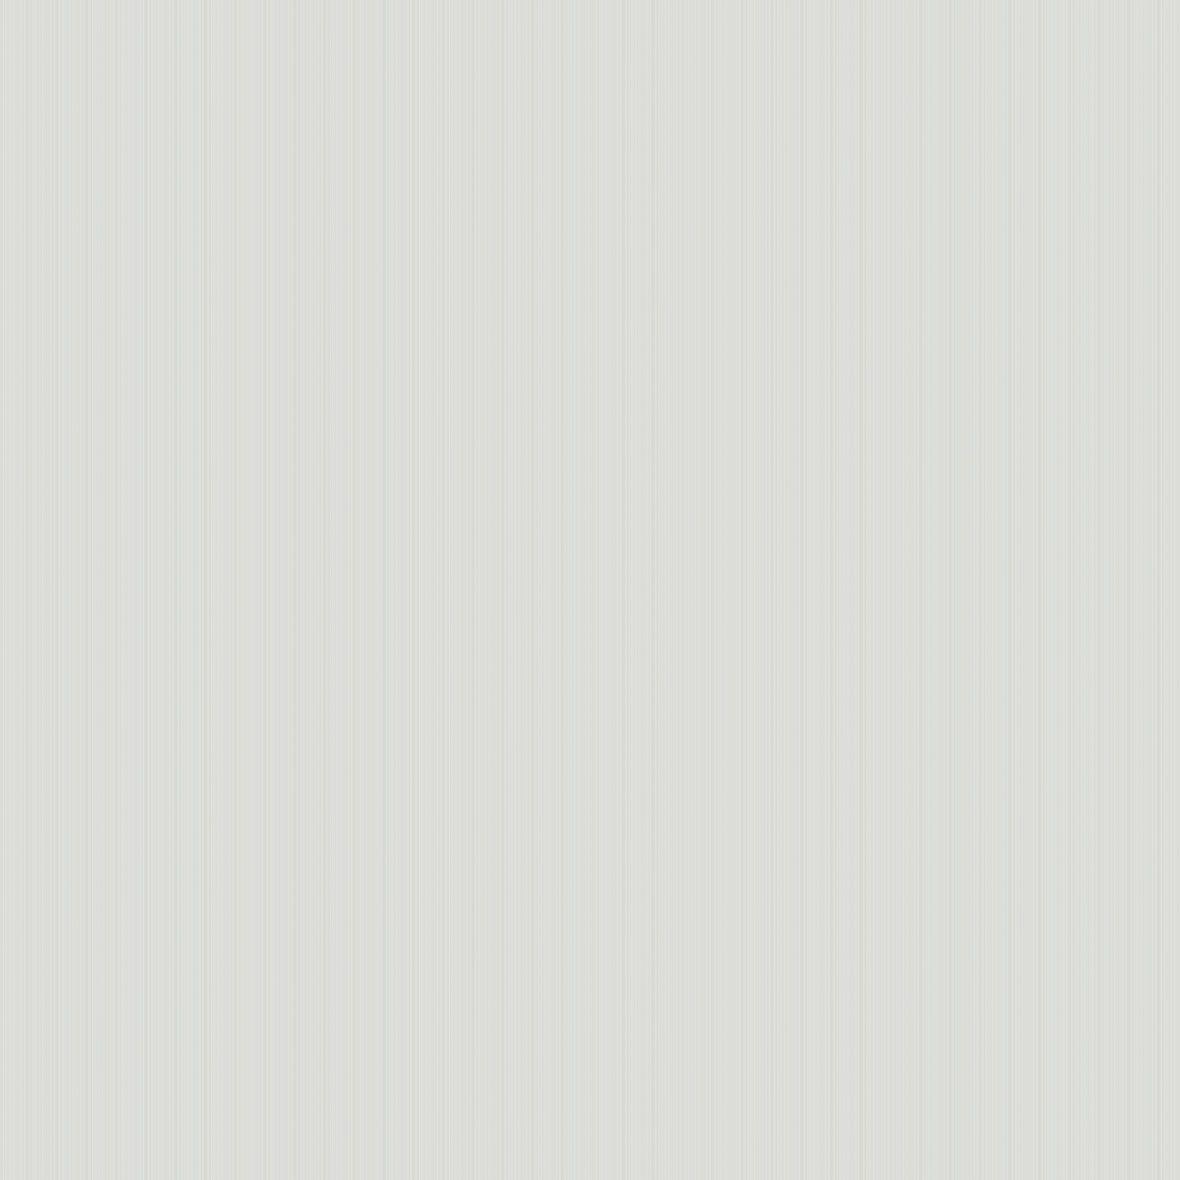 Papel de Parede Convencional Importado Mundi Roviski CD-8901  - Final Decor